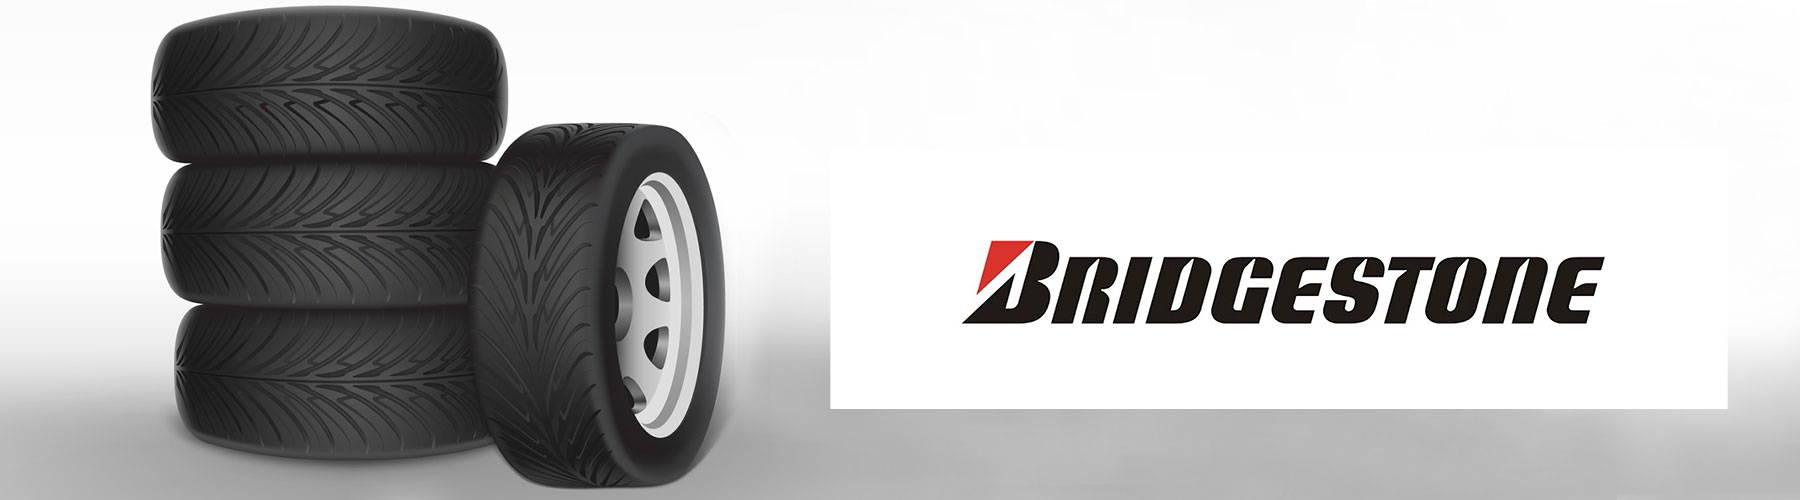 Bridgestone Tyres Logo